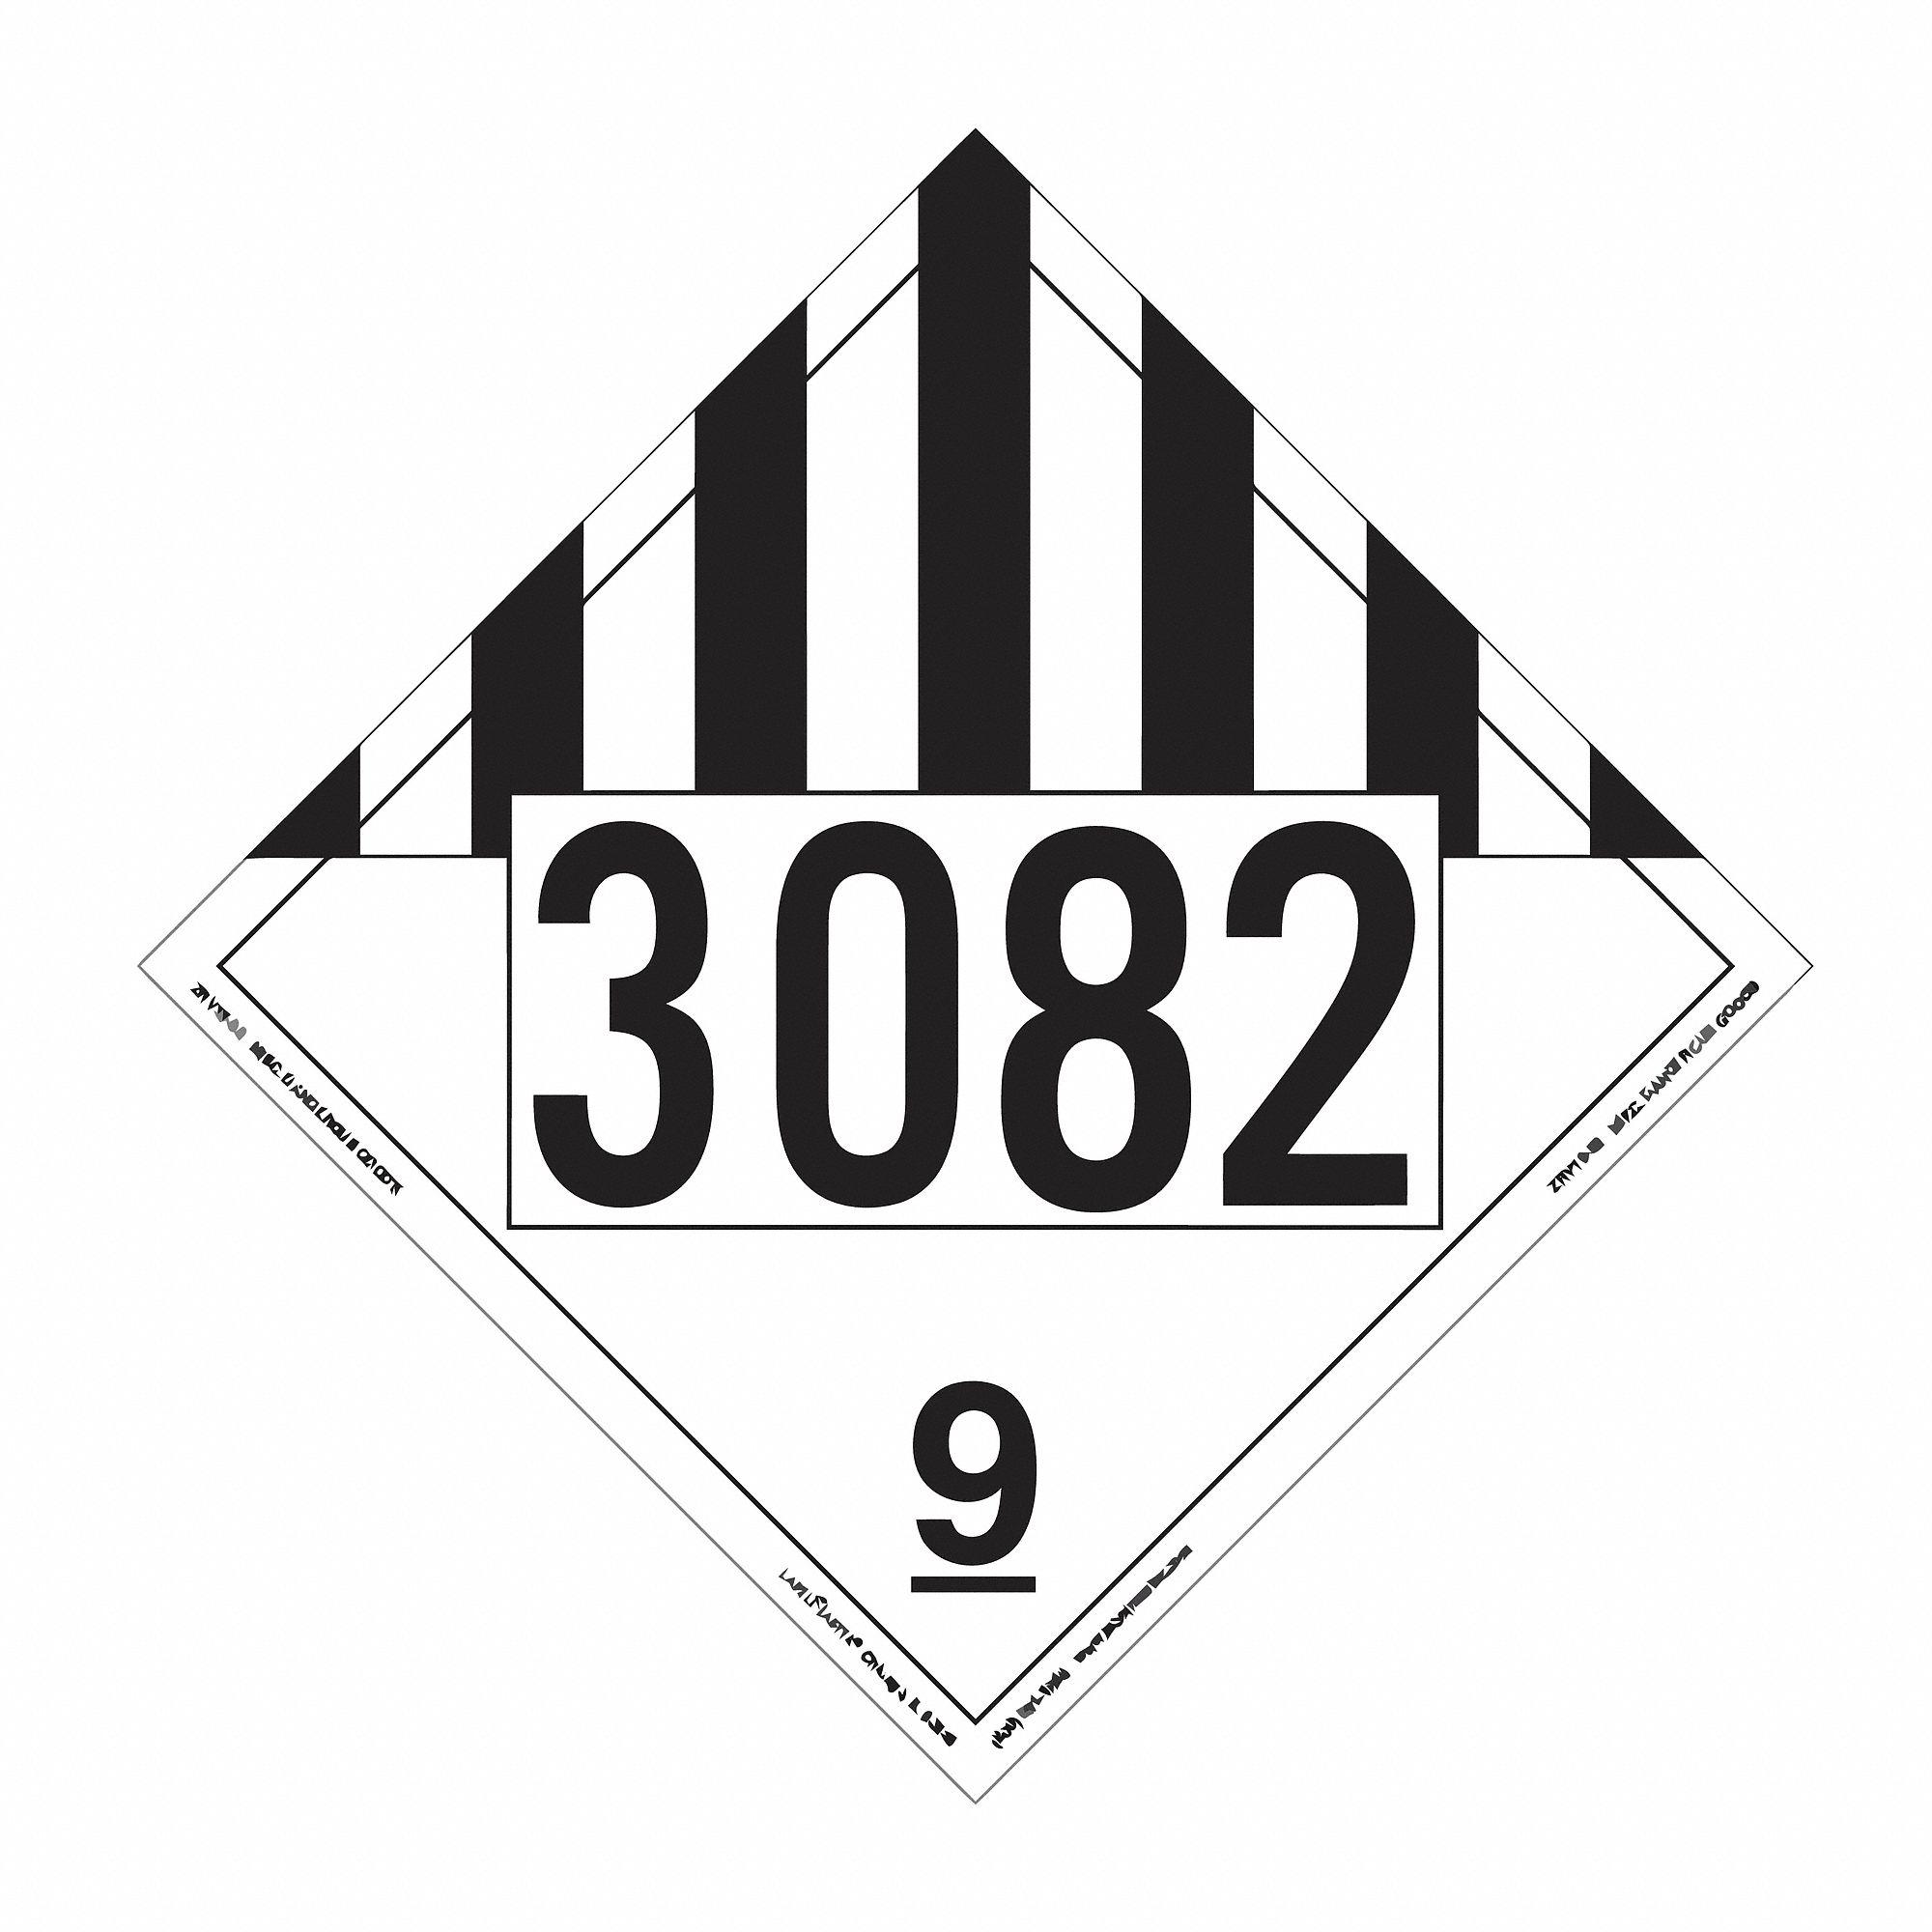 labelmaster vinyl  miscellaneous dangerous goods placard  10-3  4 u0026quot  width  10-3  4 u0026quot  height